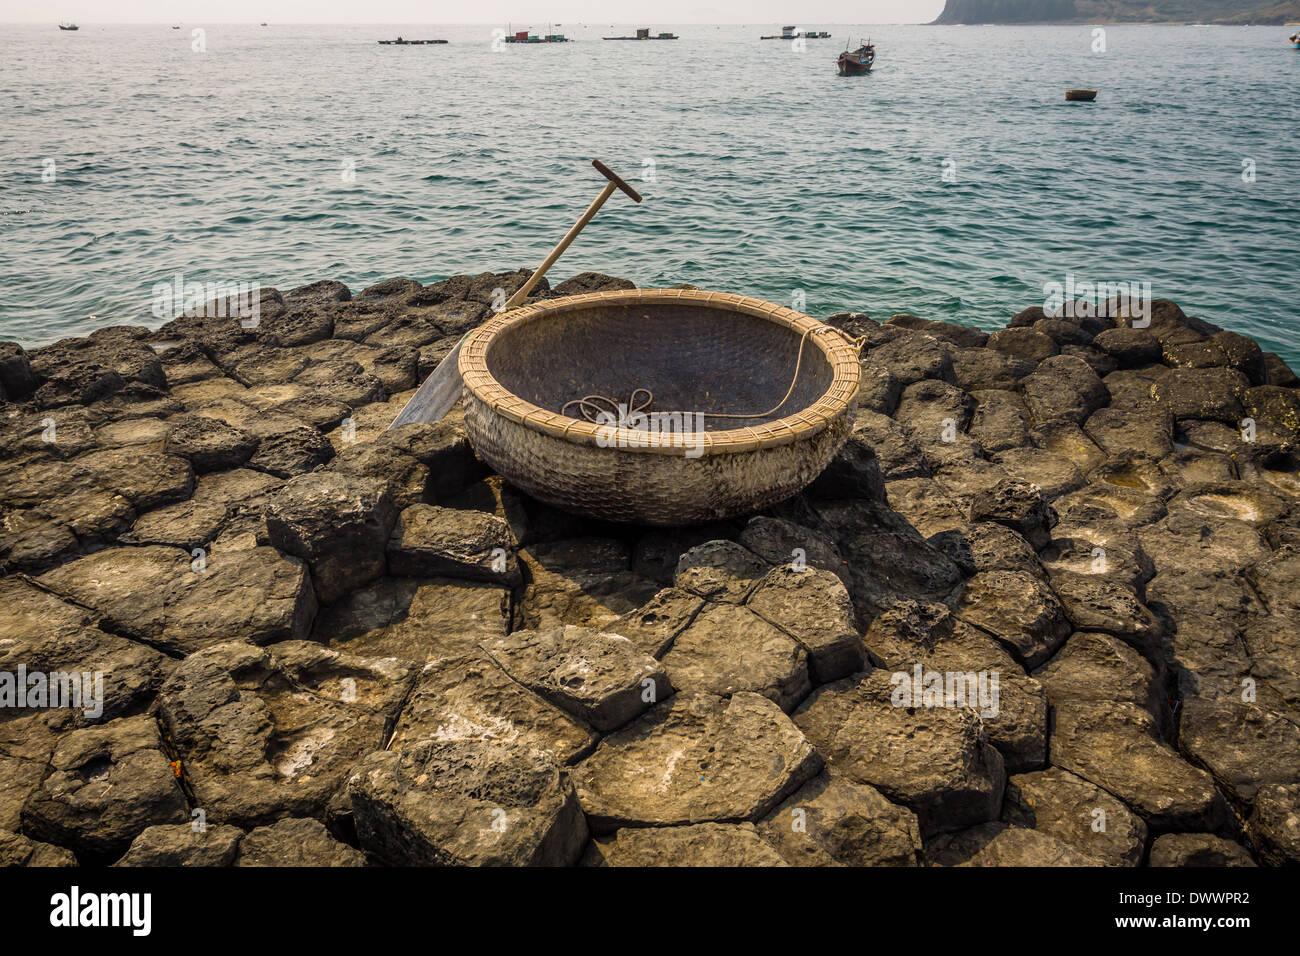 Ghenh da dia Vietnam - Stock Image